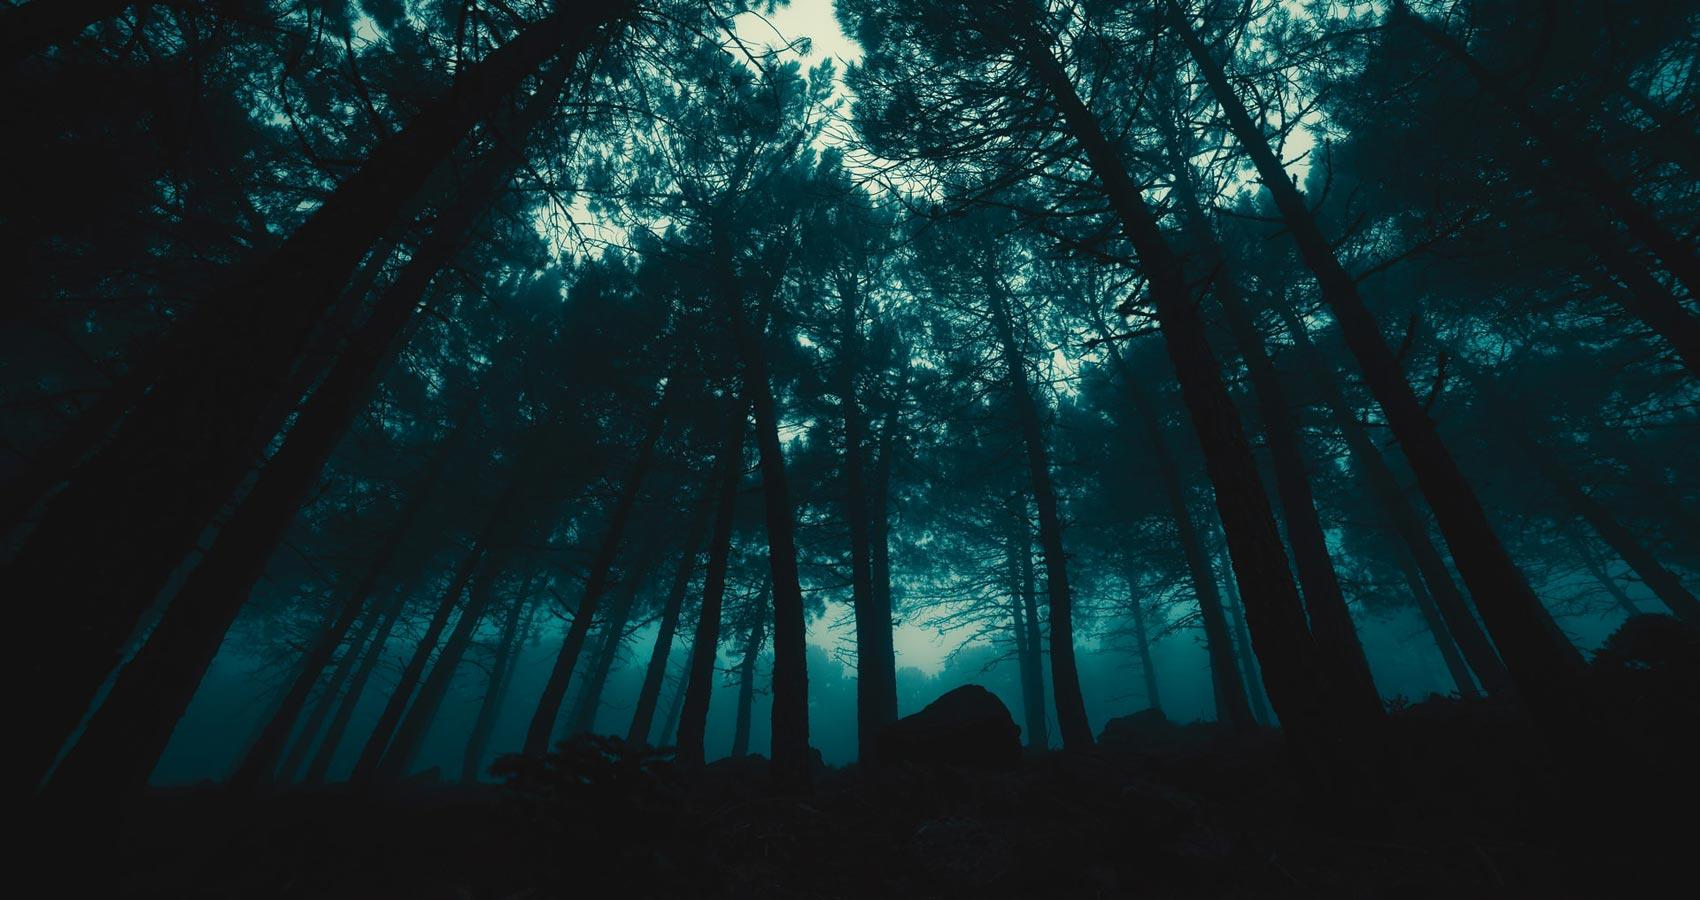 Naturaleza En Concierto, prose by José A Gómez at Spillwords.com